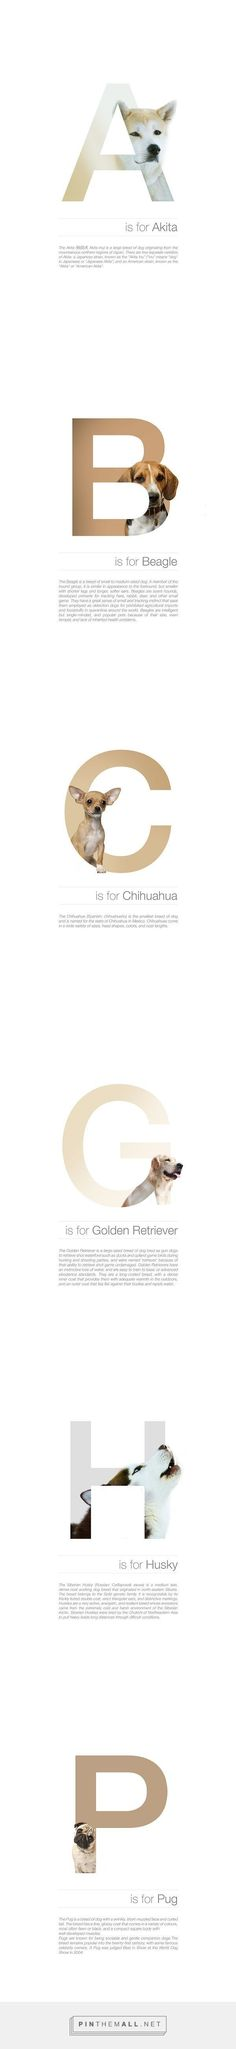 Designer Matches Letters Of The Alphabet With Different Dog Breeds - DesignTAXI. Graphisches Design, Book Design, Layout Design, Creative Design, Print Design, Dog Logo Design, Design Trends, Inspiration Typographie, Typography Inspiration